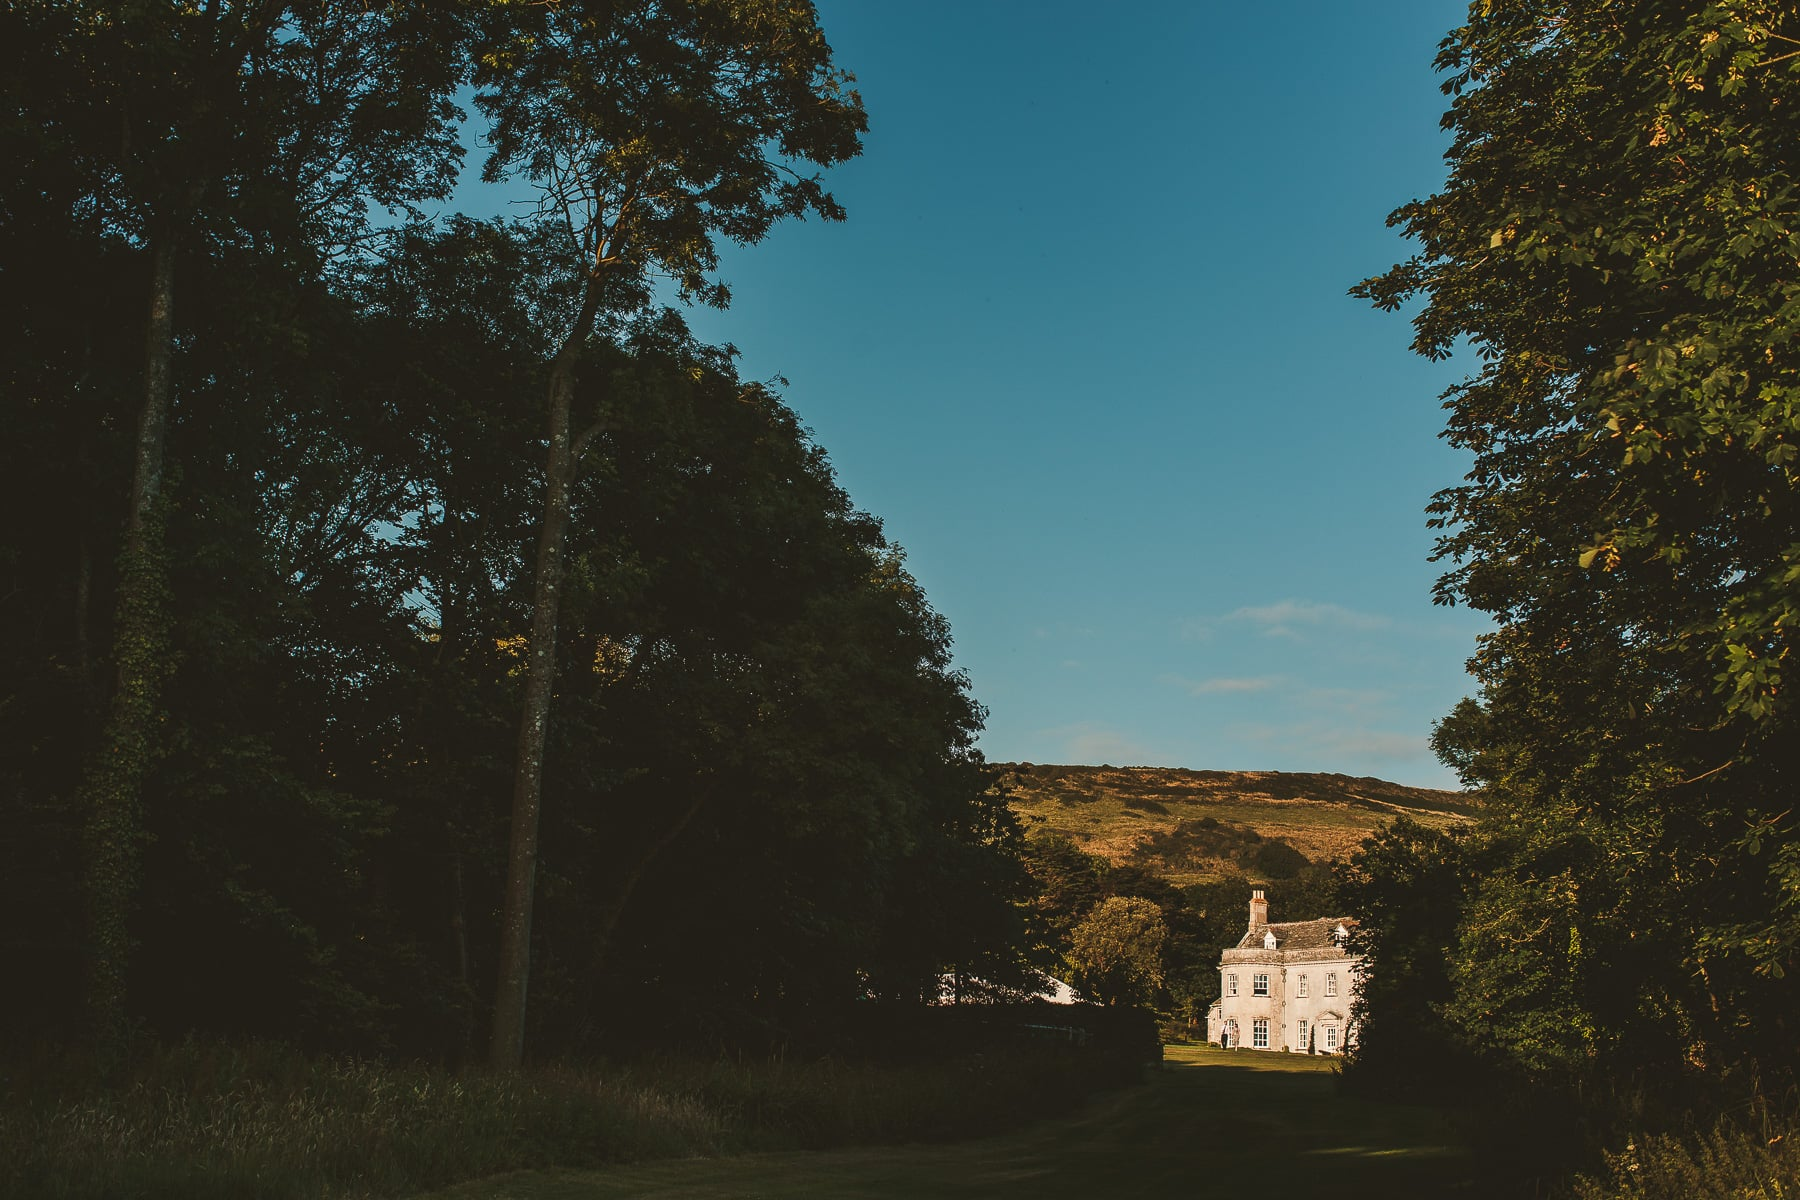 Smedmore House weddng venue